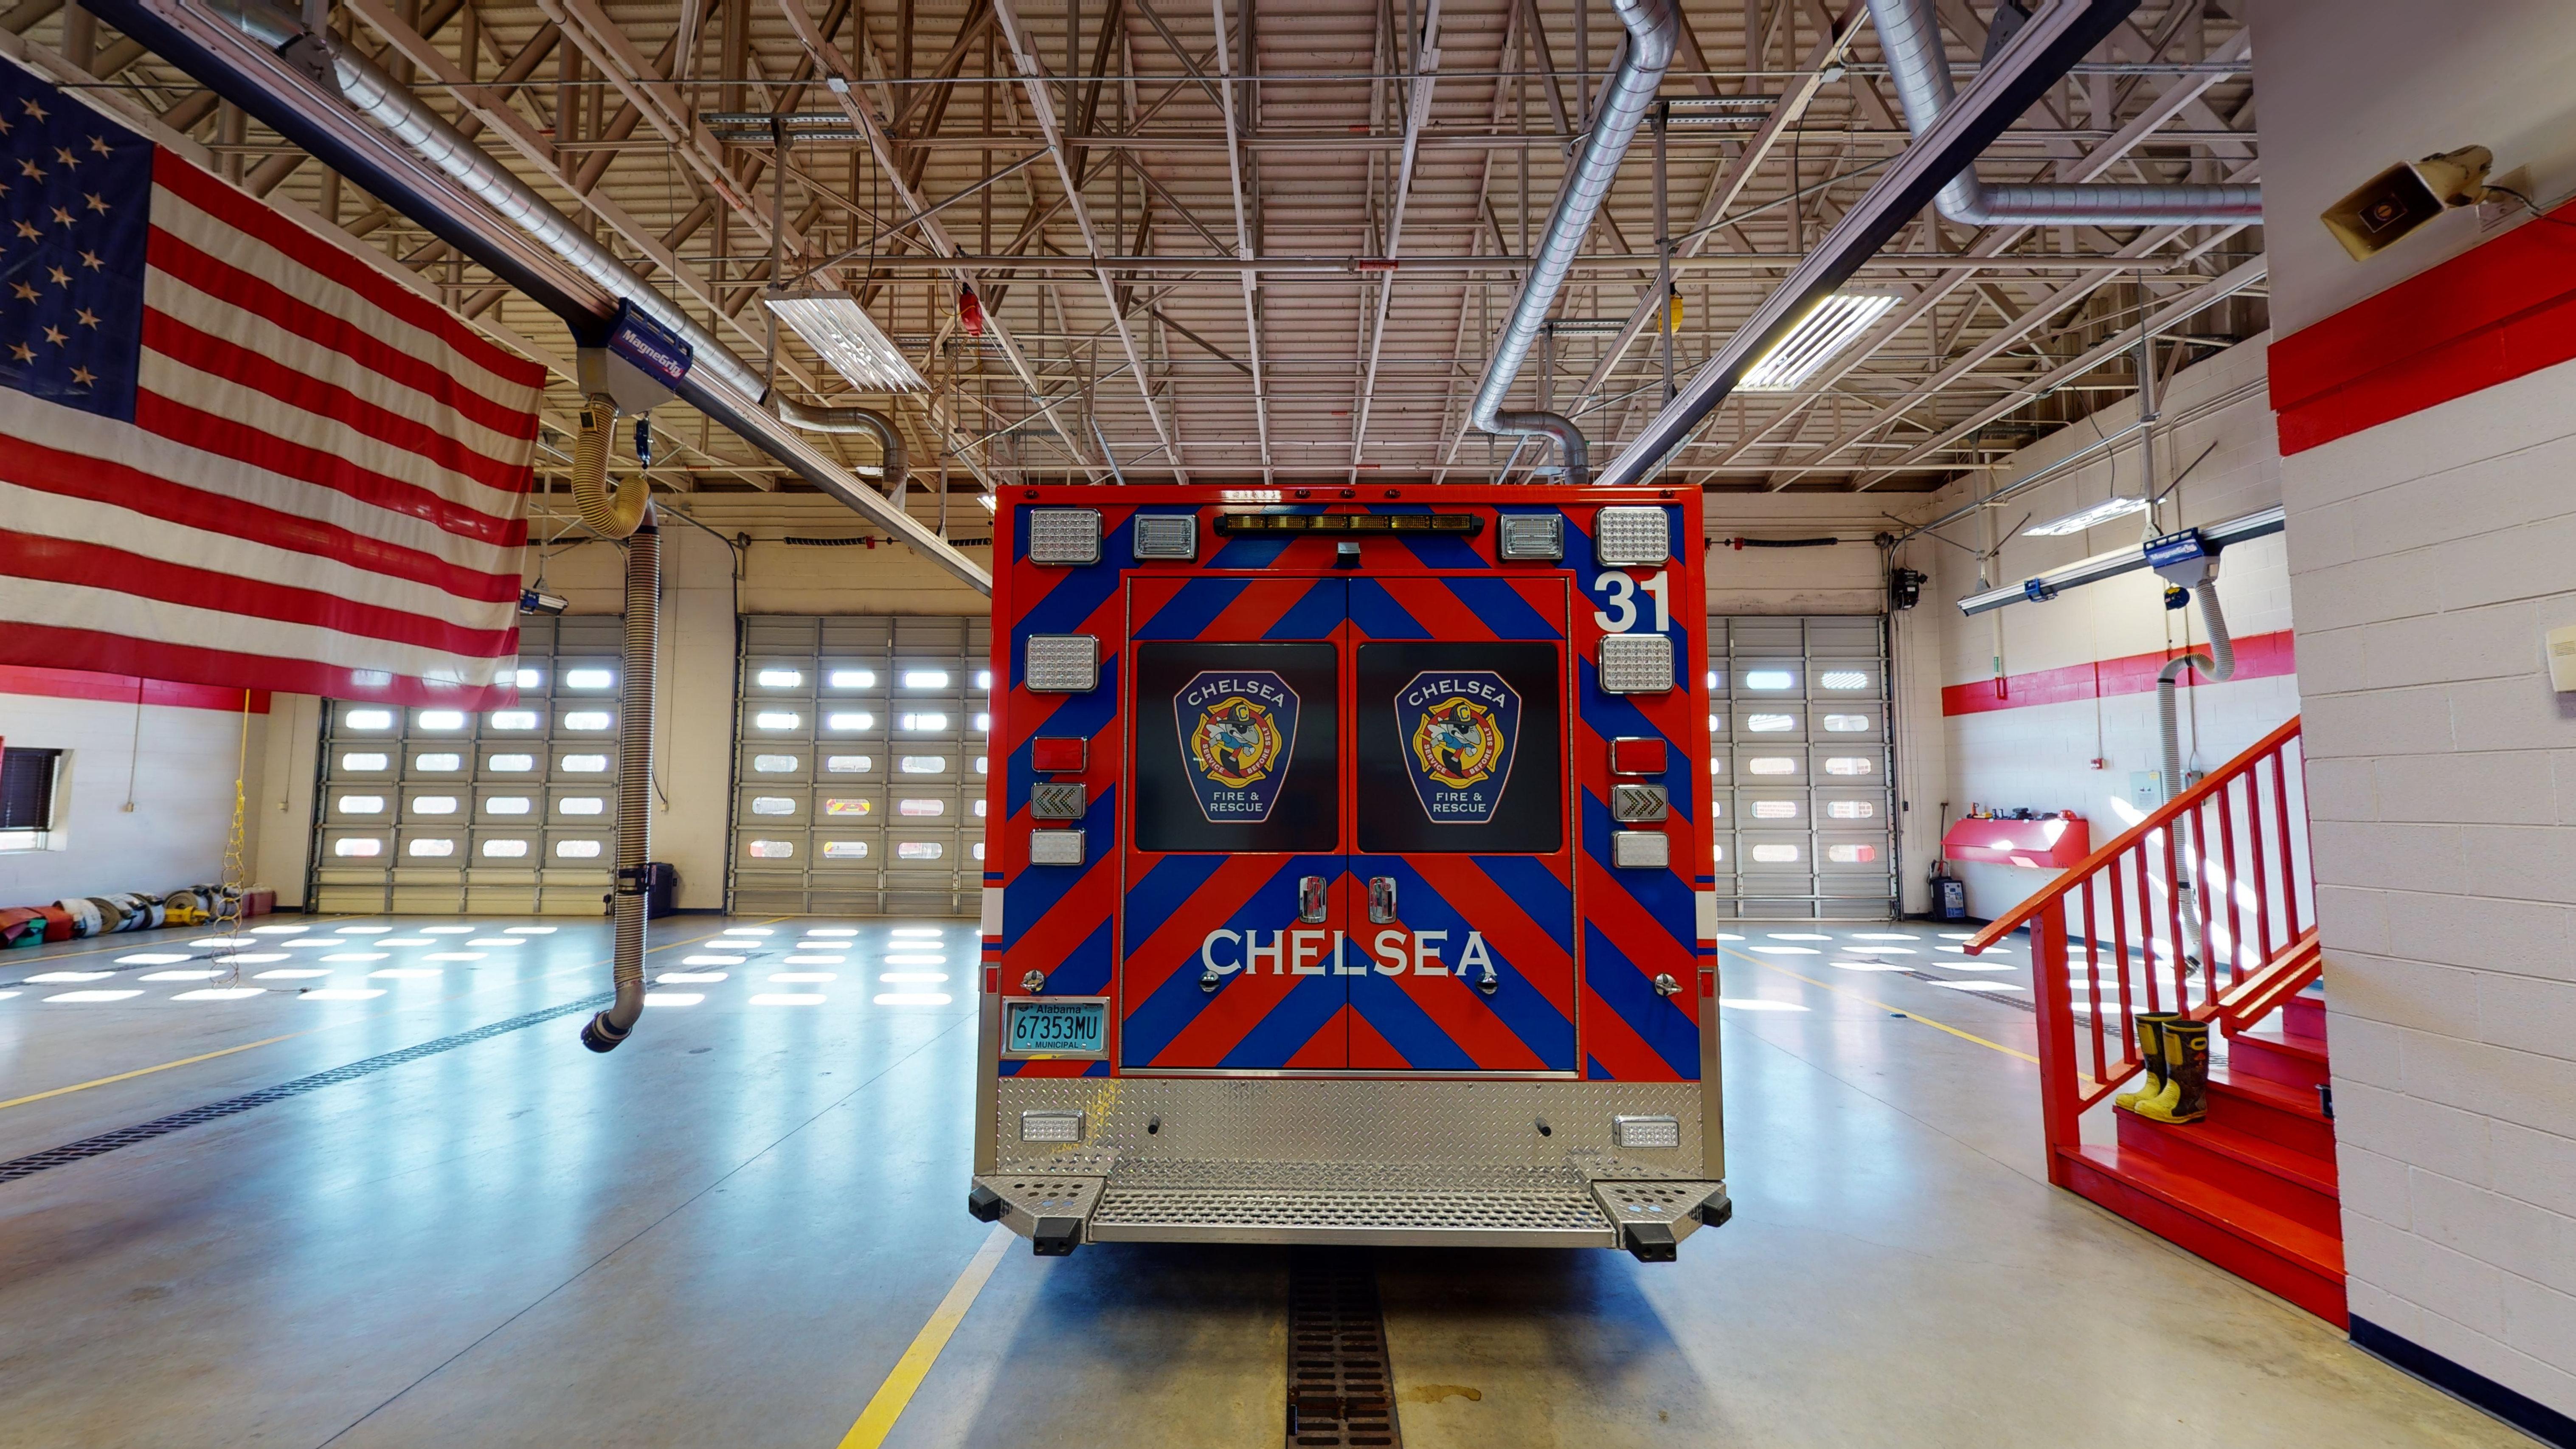 3_Chelsea-Fire-Rescue-Demers-151-06162021_101145